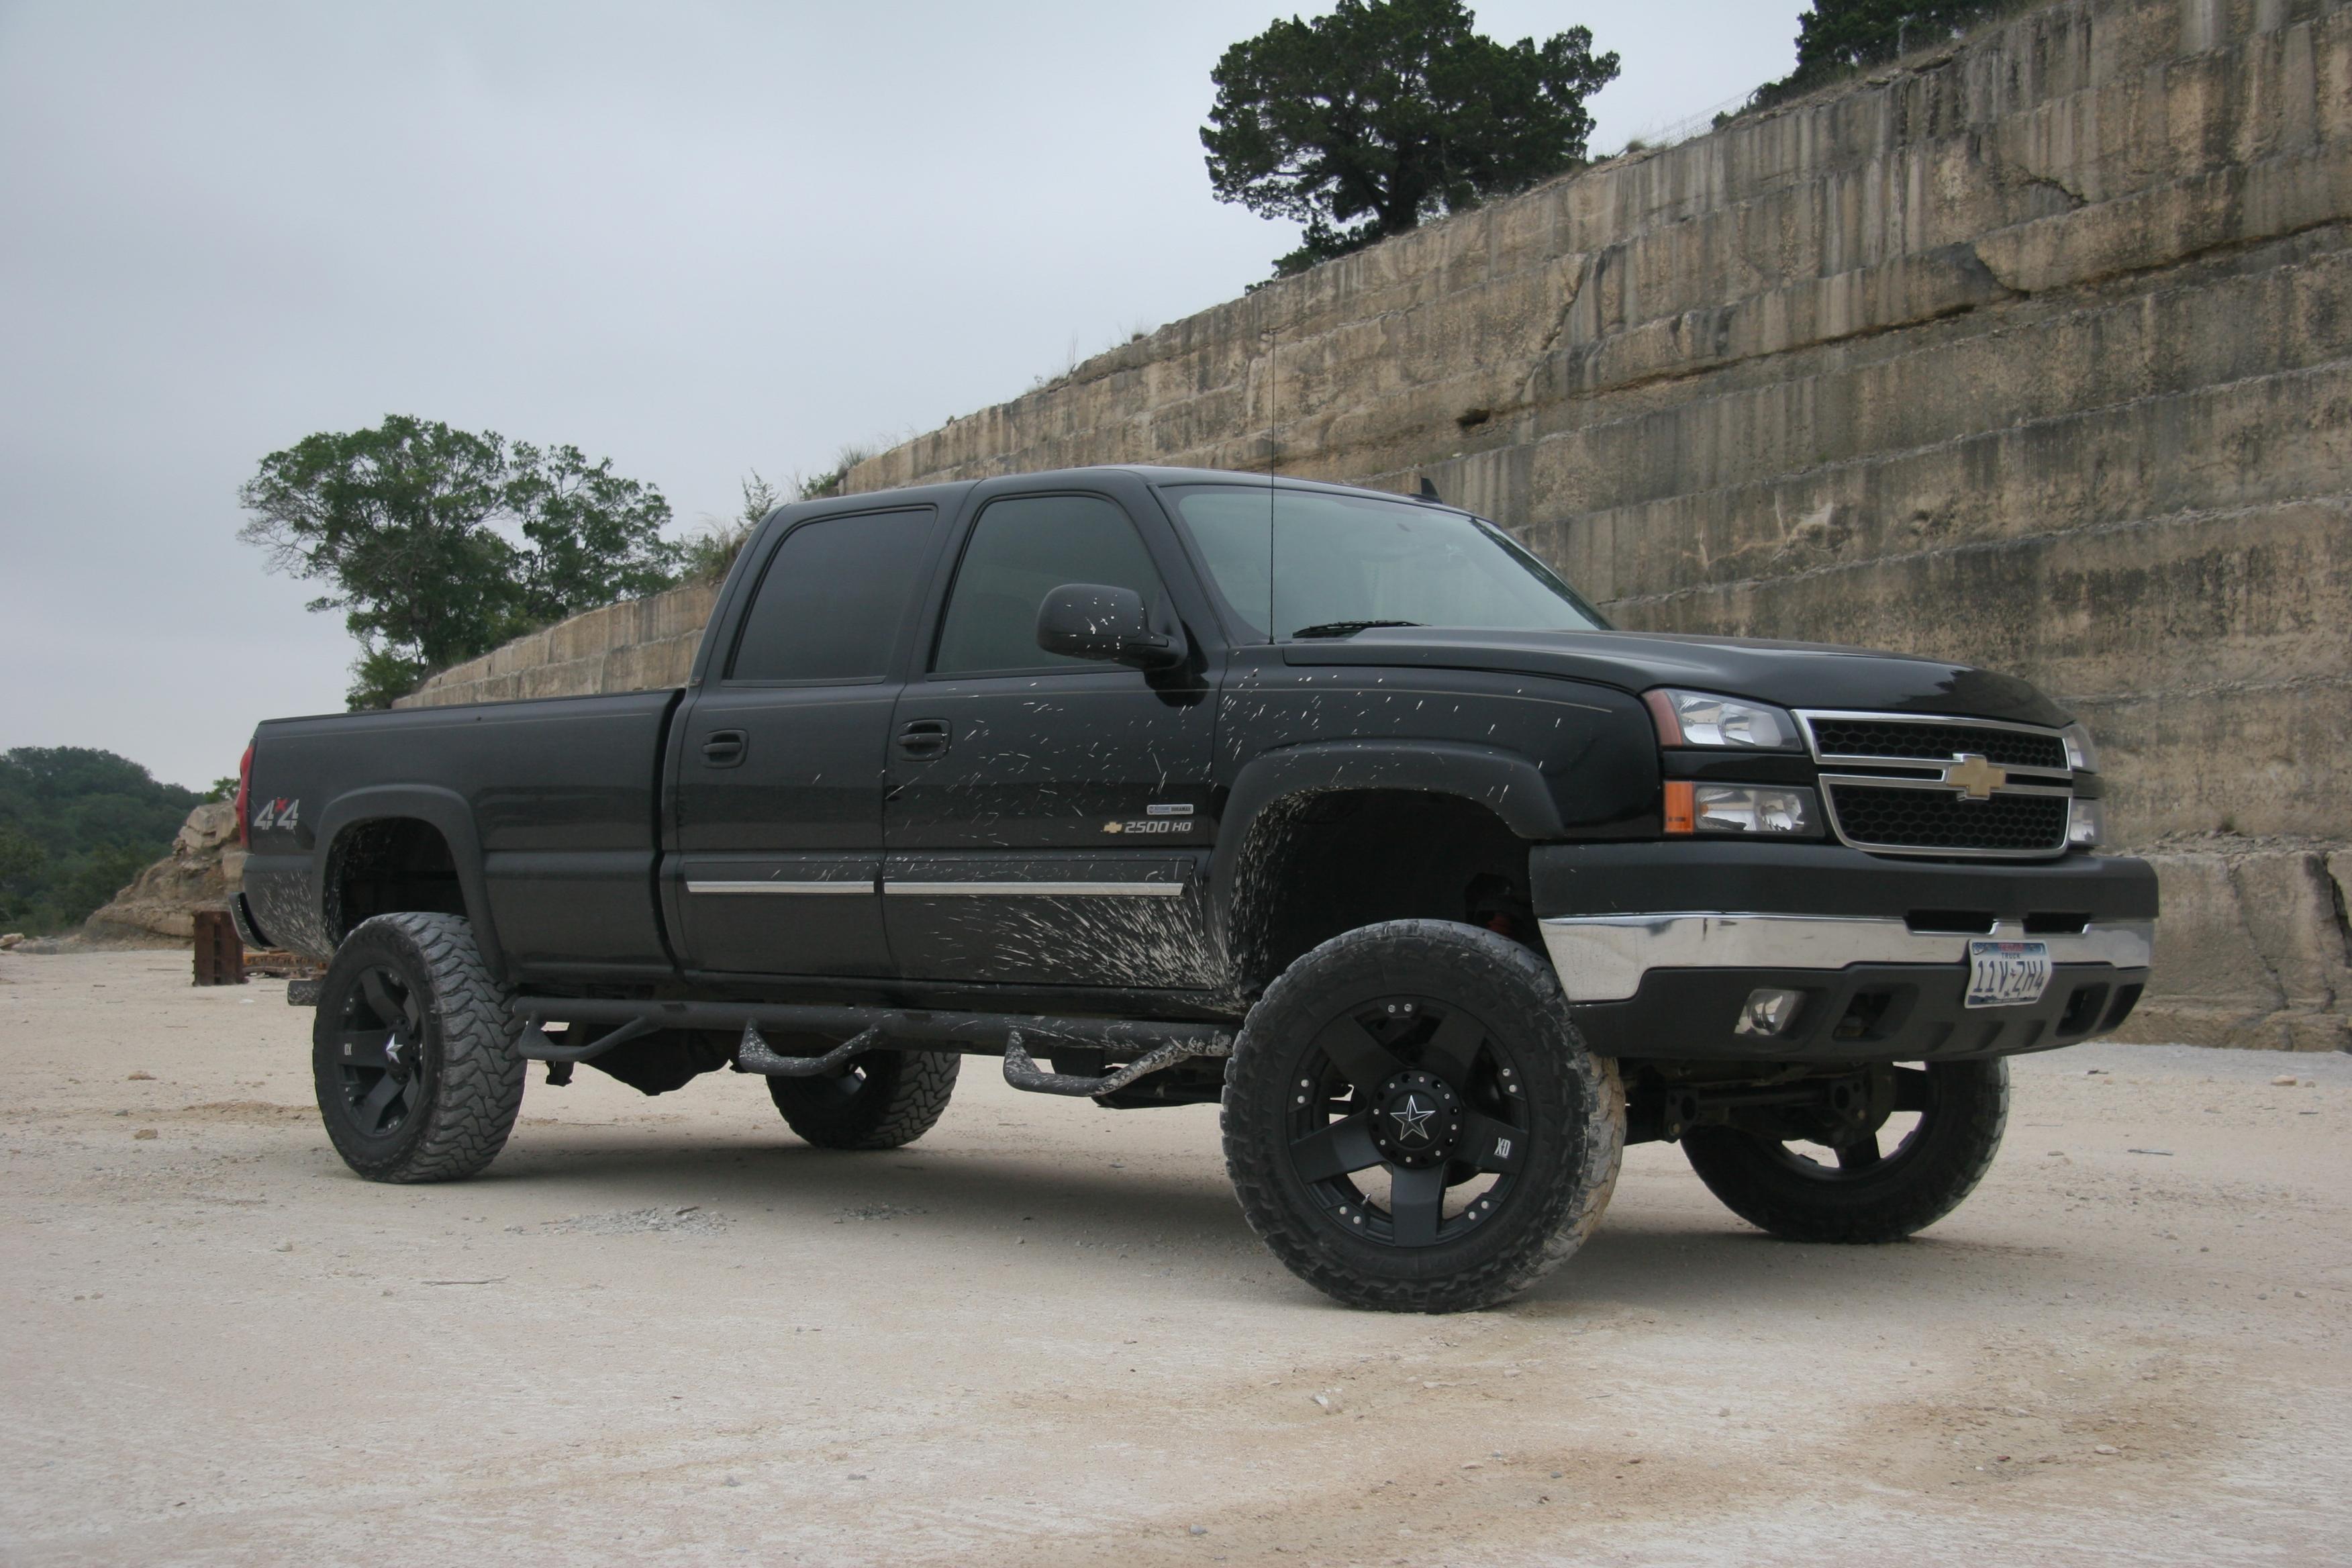 Awesome Jacked Up Trucks >> Jacked Up Trucks Wallpapers - WallpaperSafari